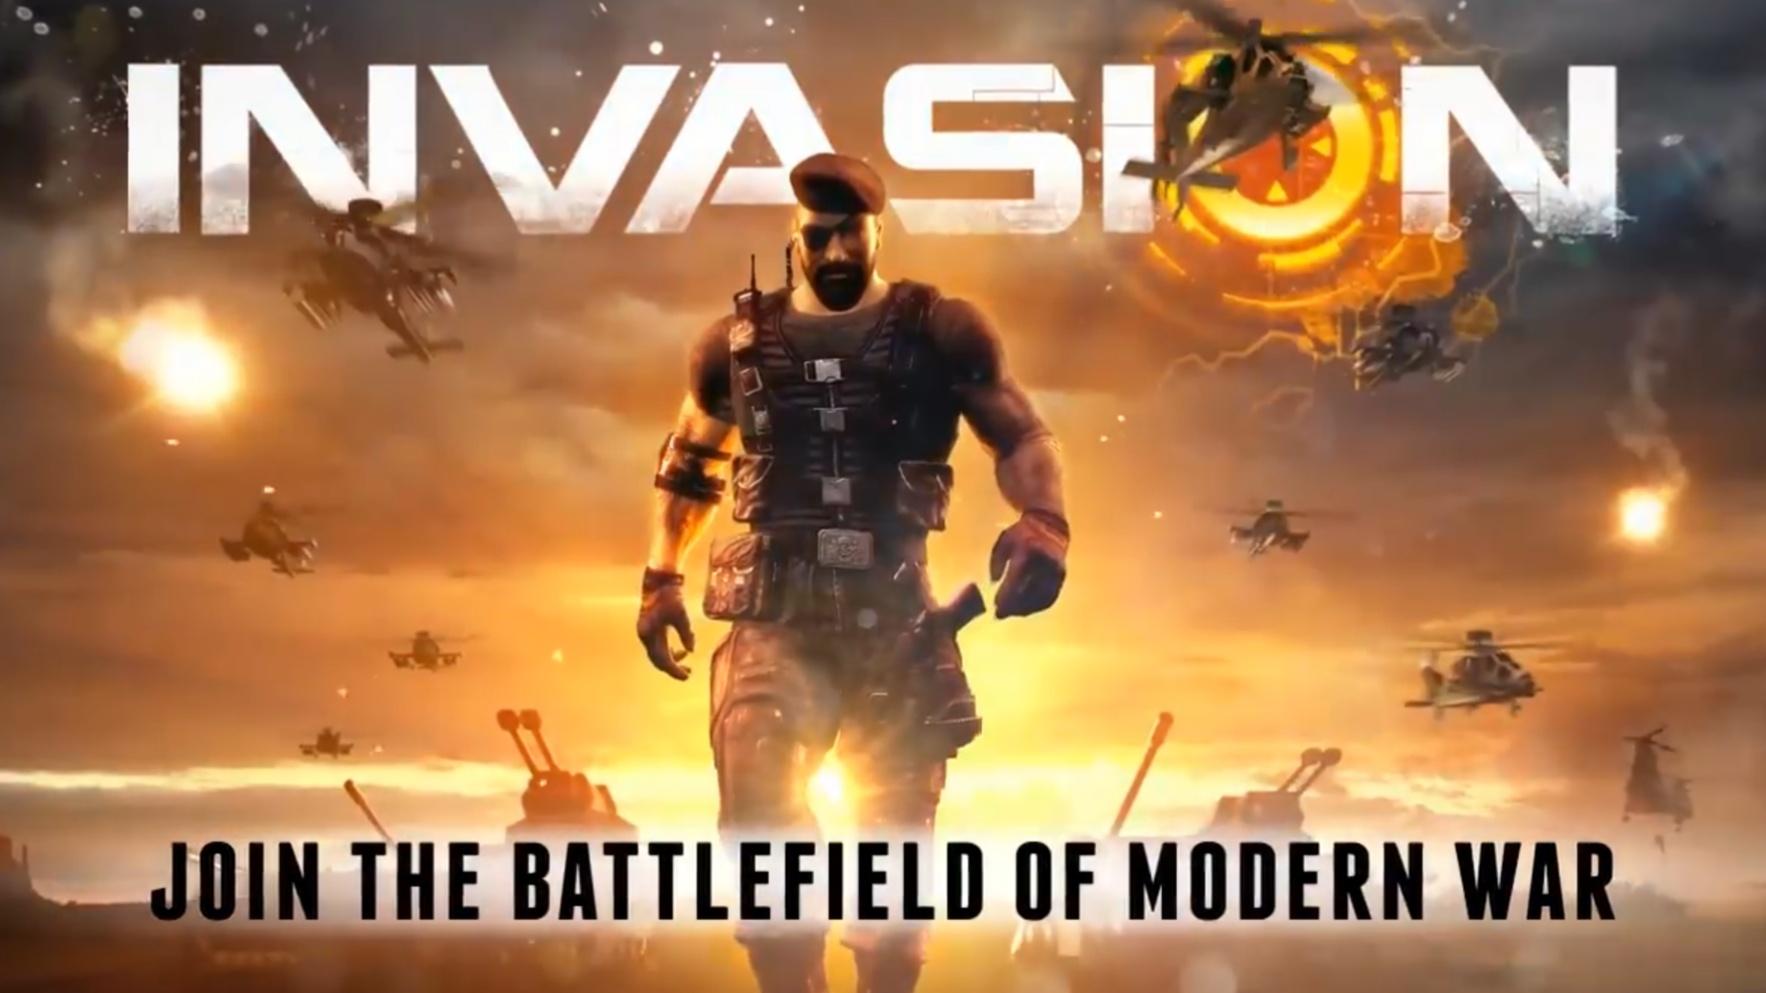 Invasion: Modern Empire MOD APK